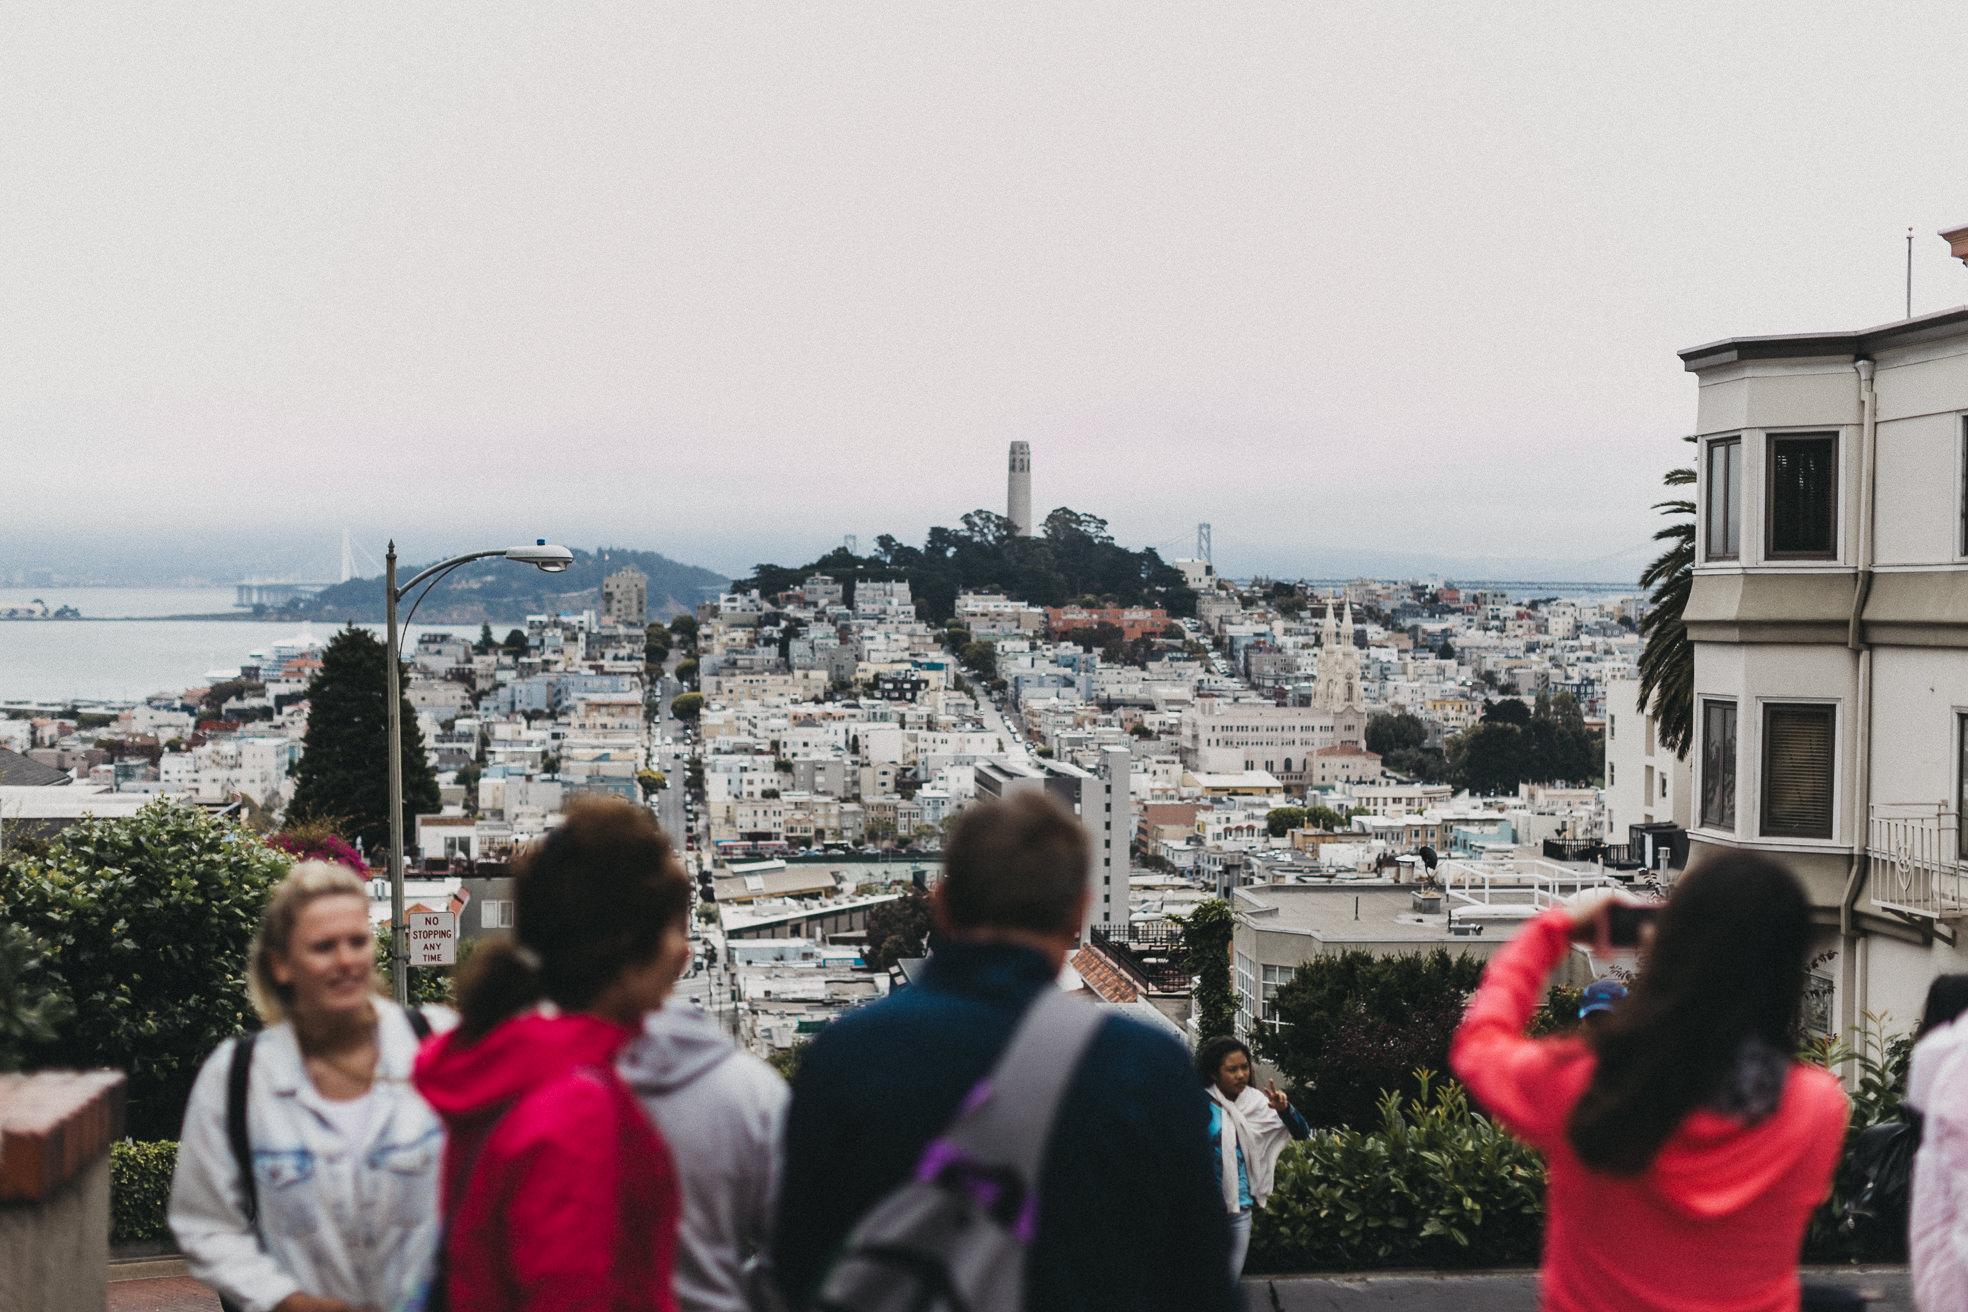 San-Francisco-BildervomLeben-7927